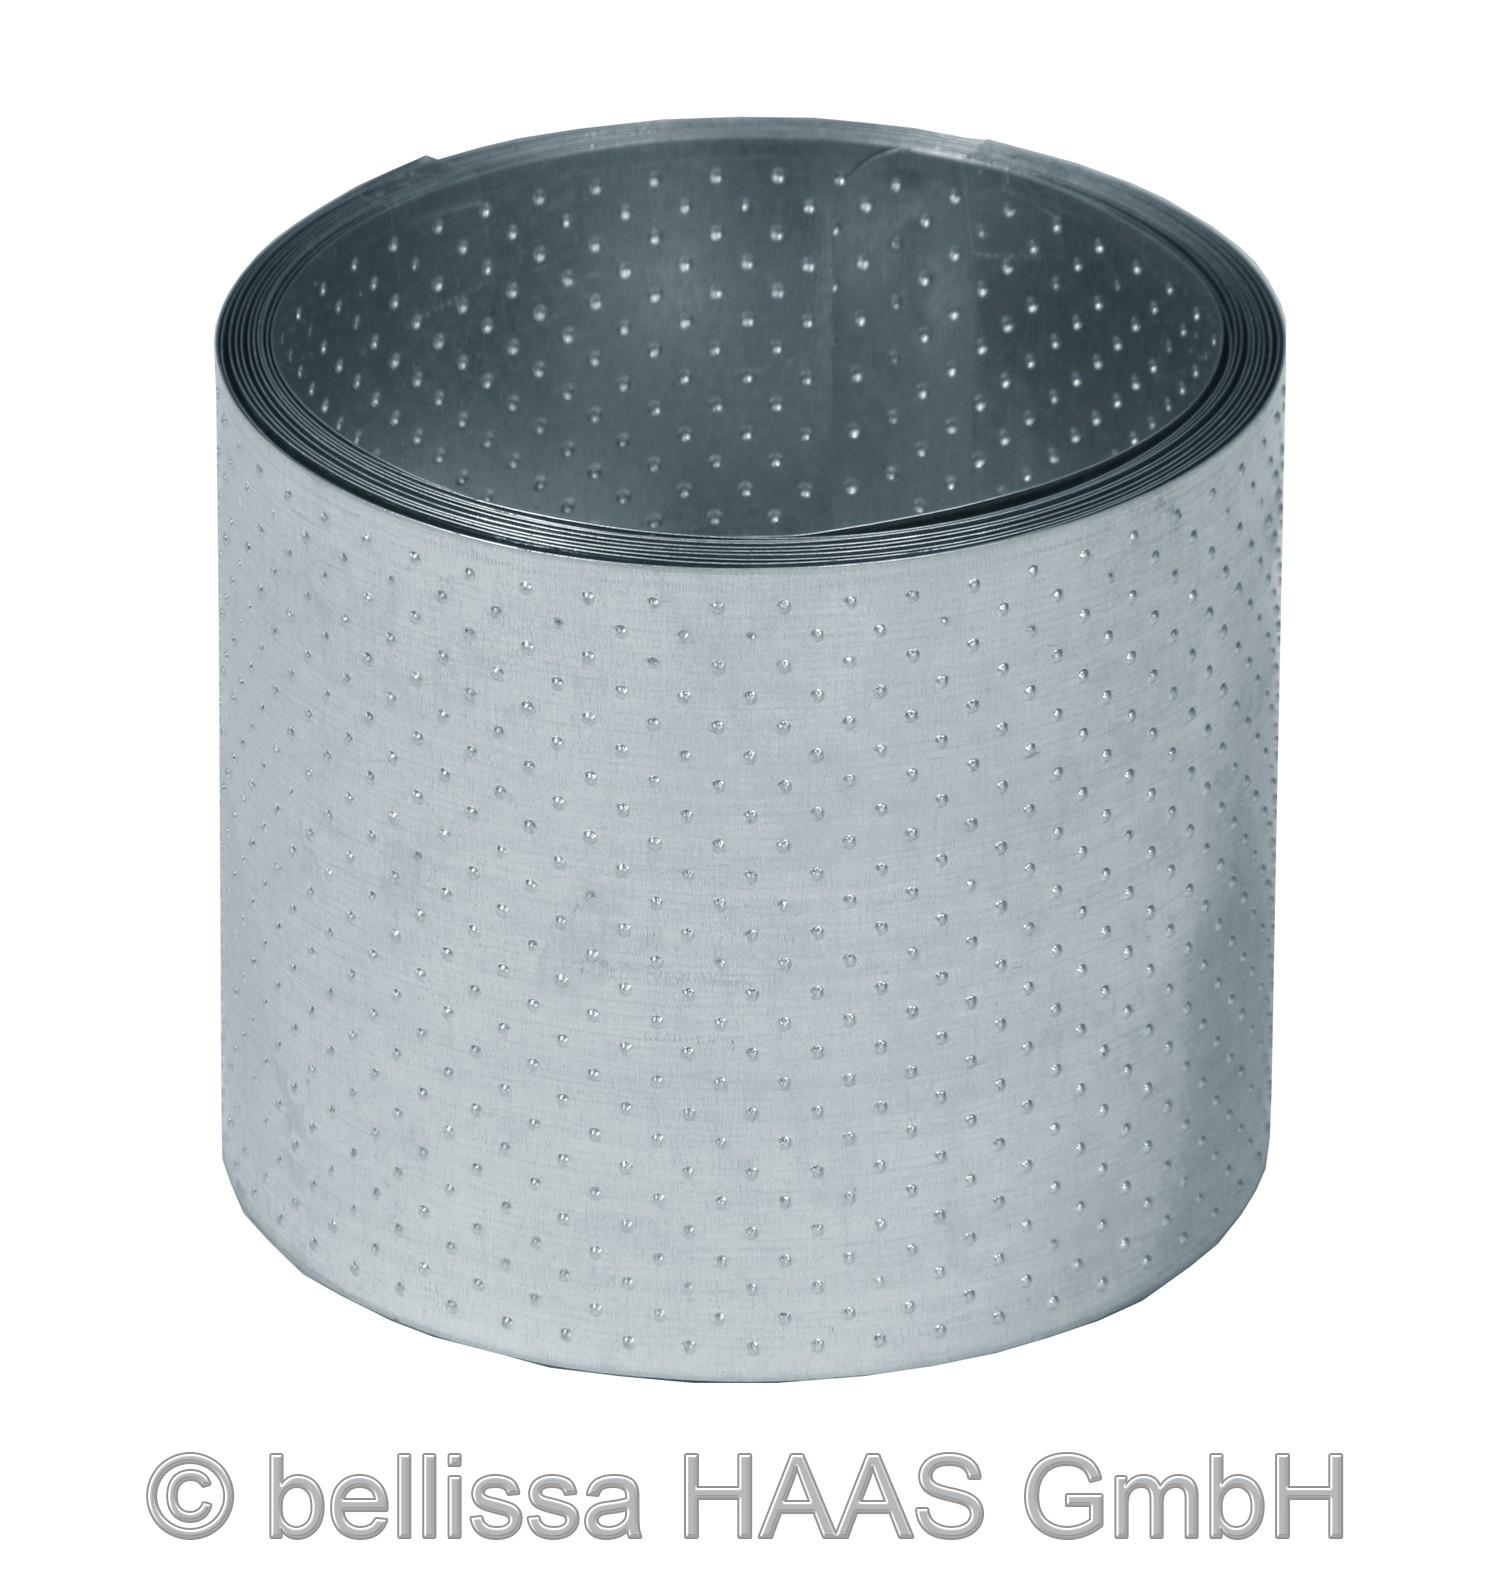 rasenkante metall verzinkt noppenstruktur bellissa l500xh14cm bei. Black Bedroom Furniture Sets. Home Design Ideas